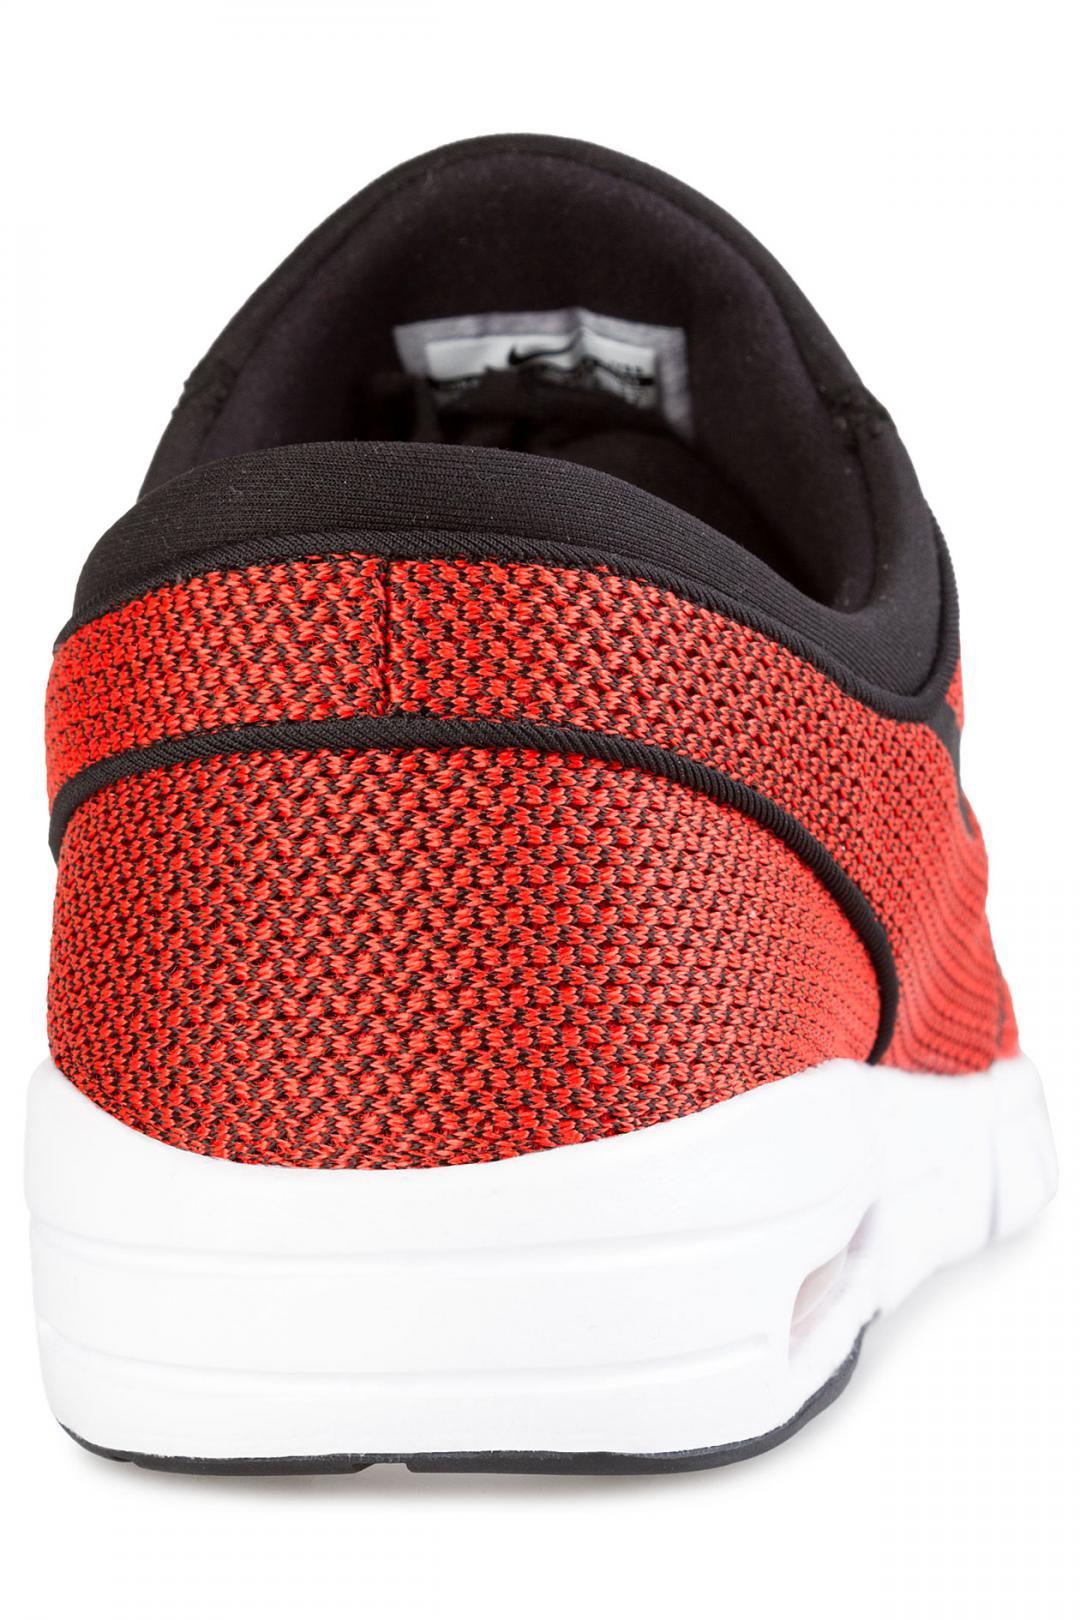 Uomo Nike SB Stefan Janoski Max black max orange   Sneakers low top